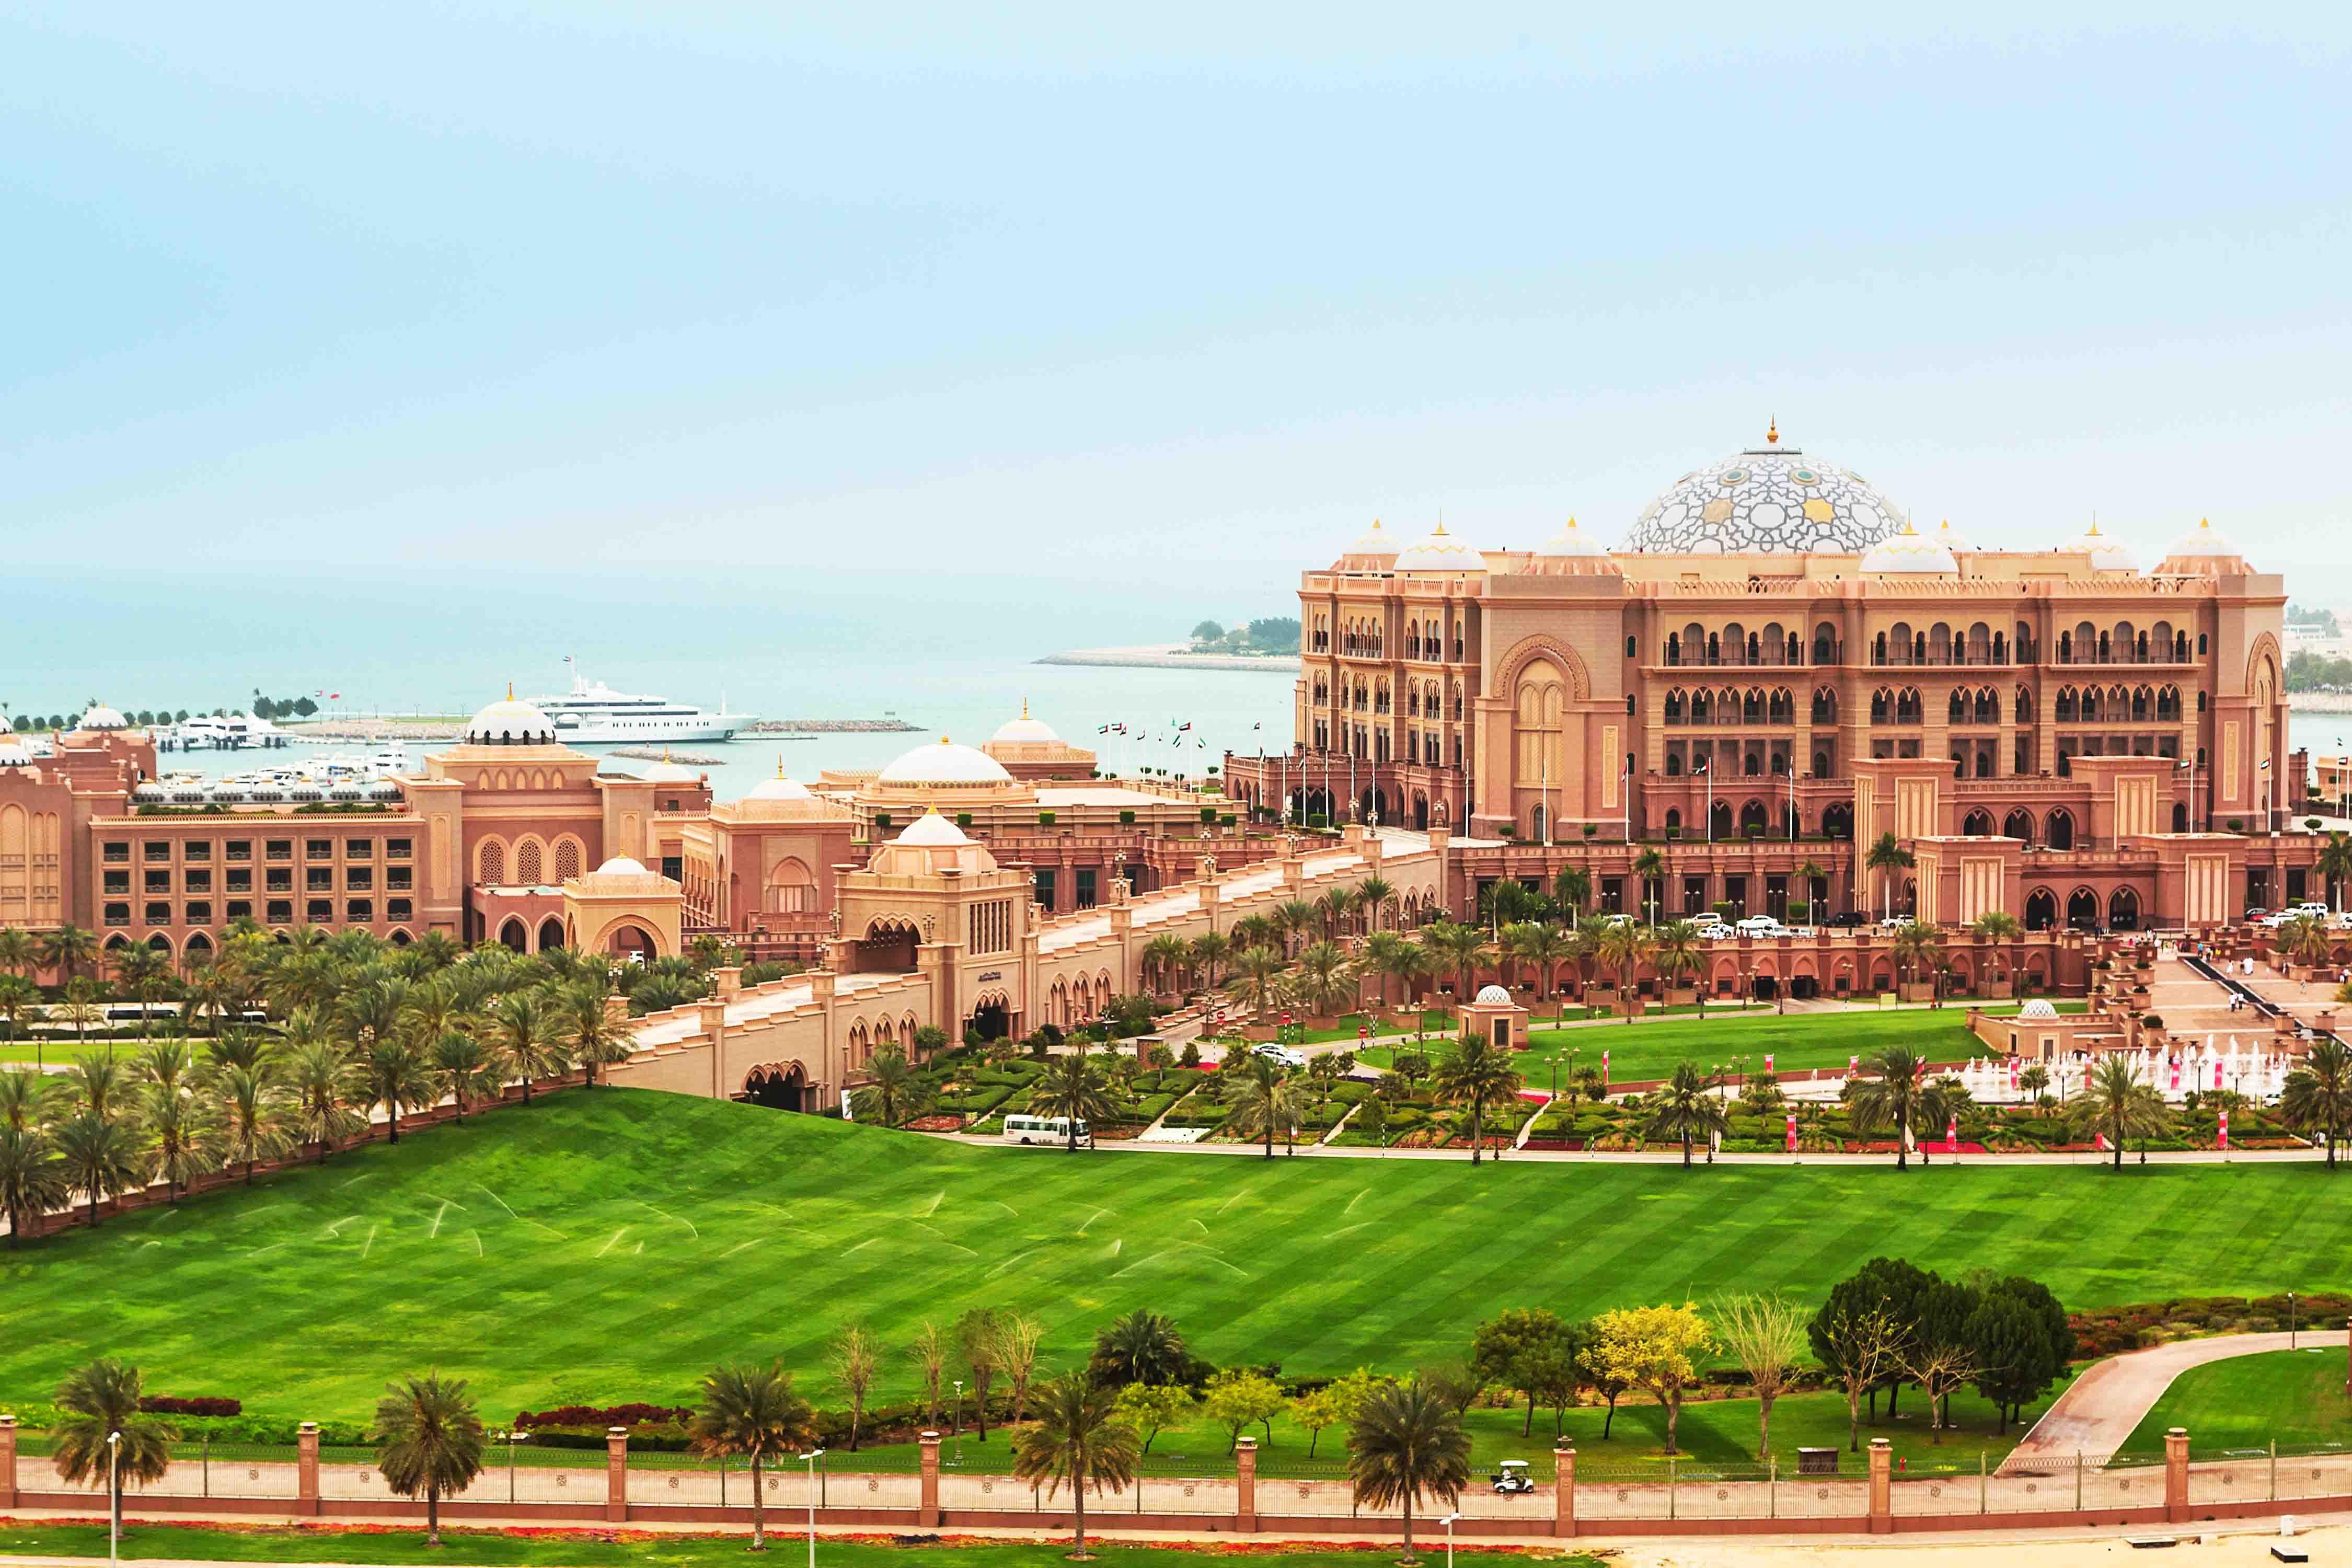 Emirates Palace-Abu Dhabi City Tour from Dubai